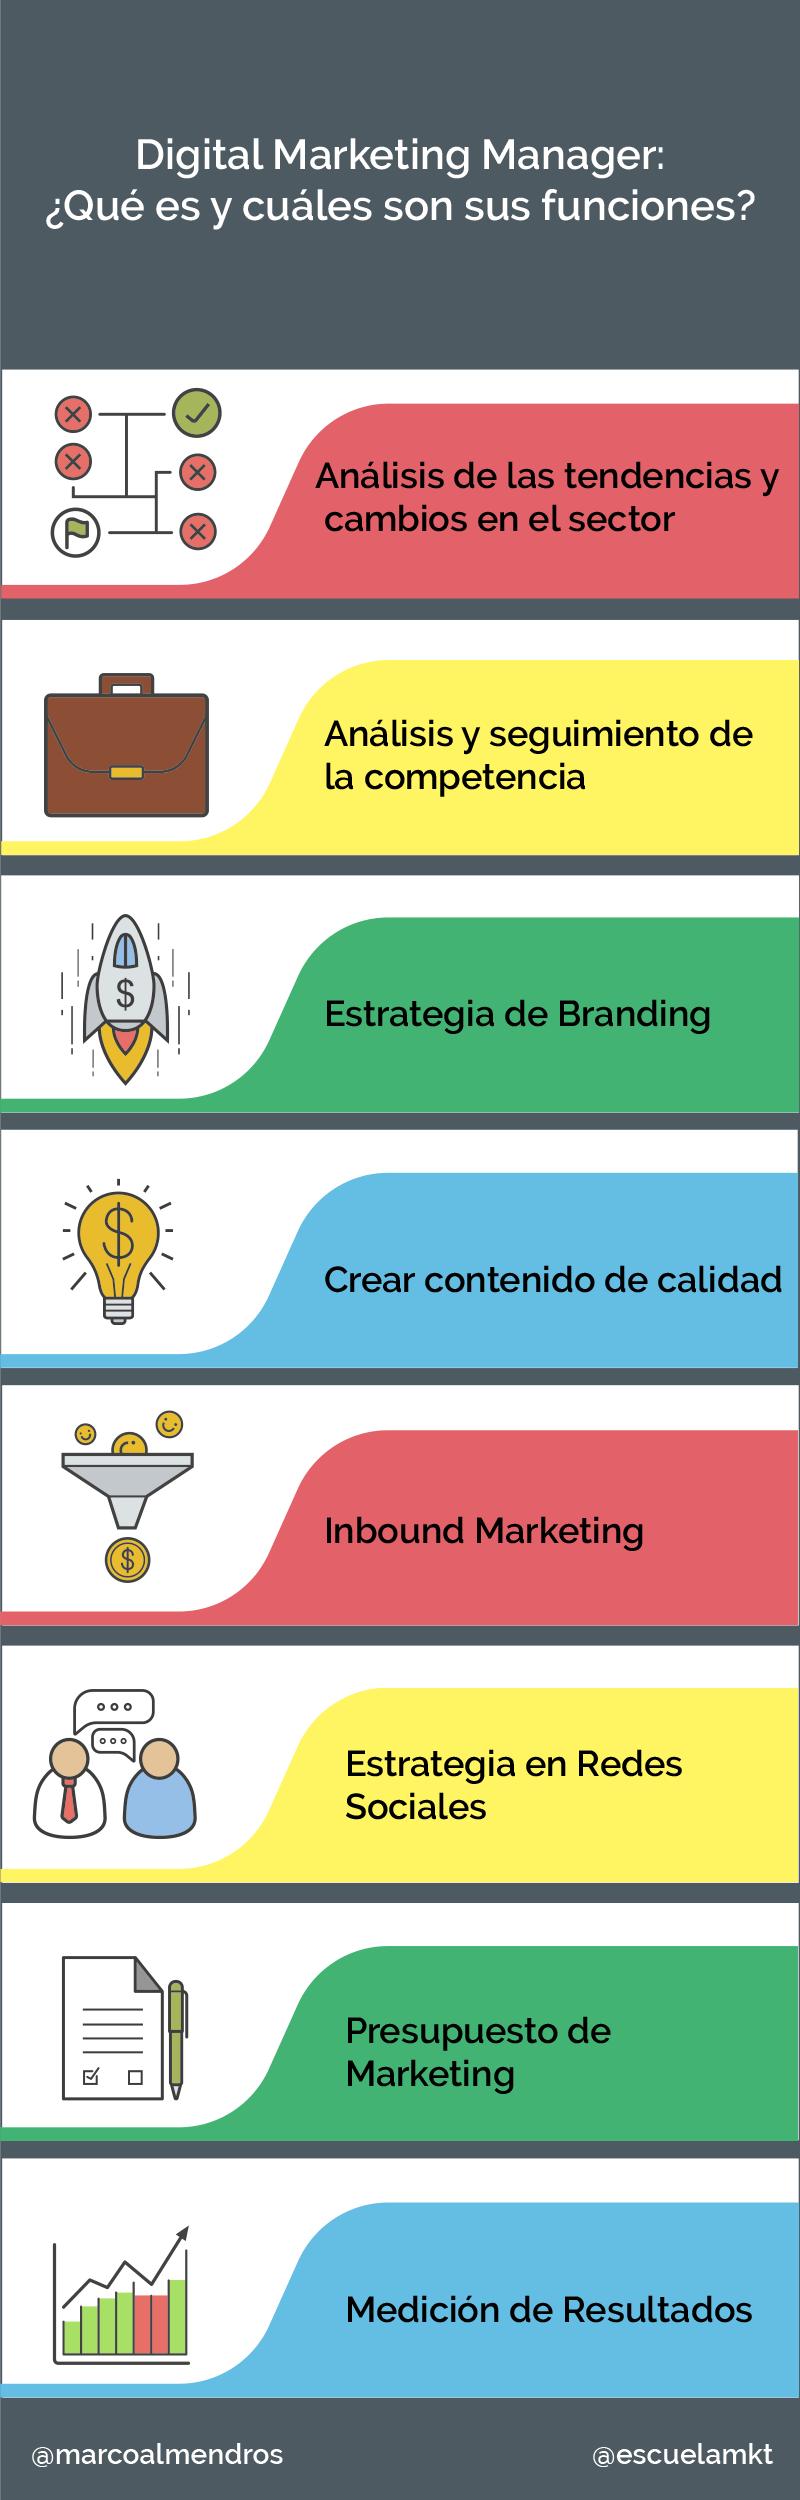 infografia digital marketing manager